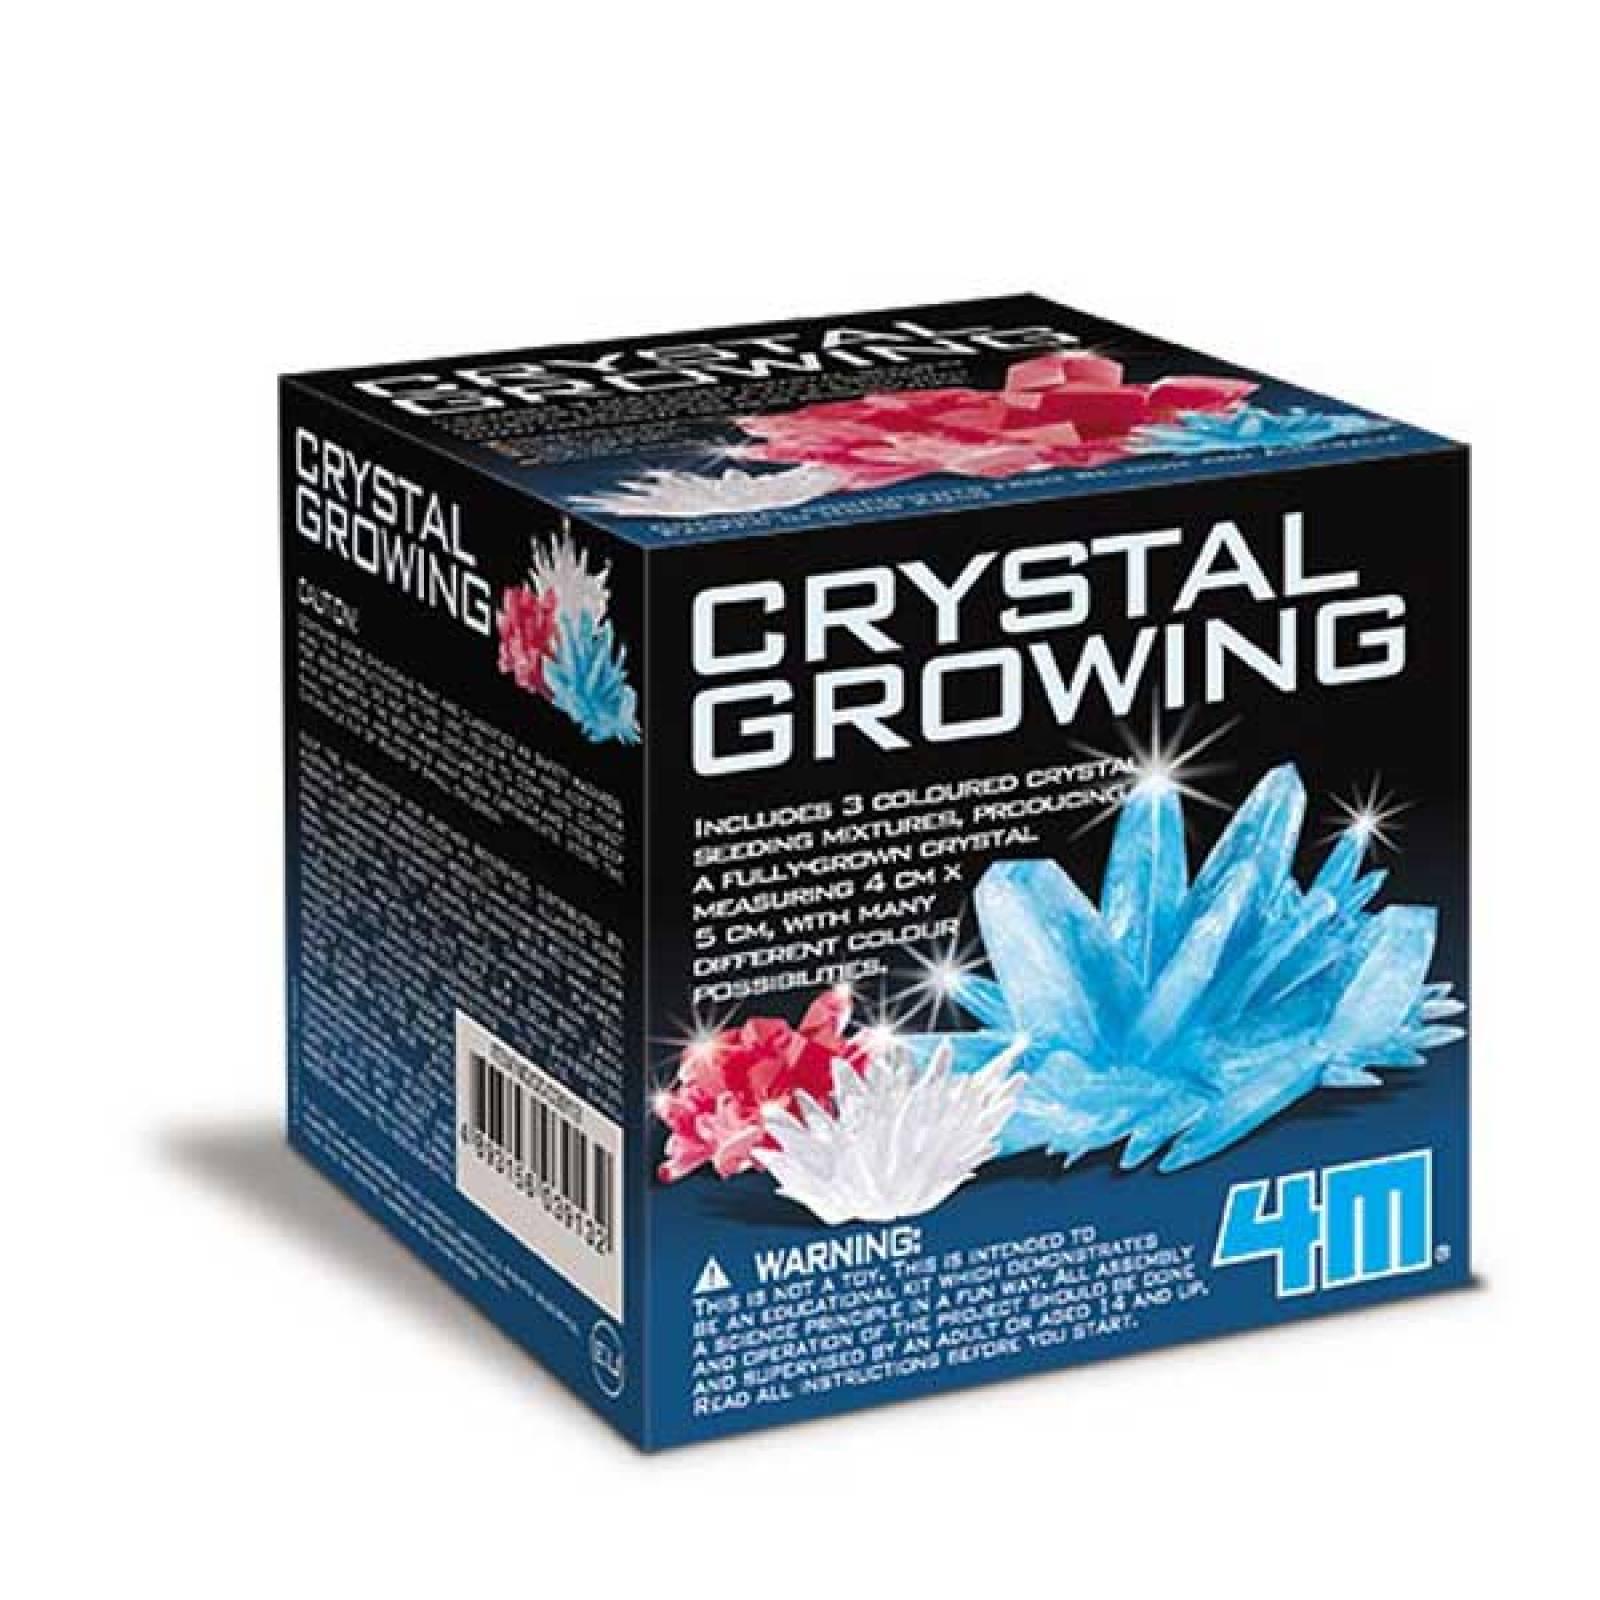 Crystal Growing Kit - Science Kit 14+